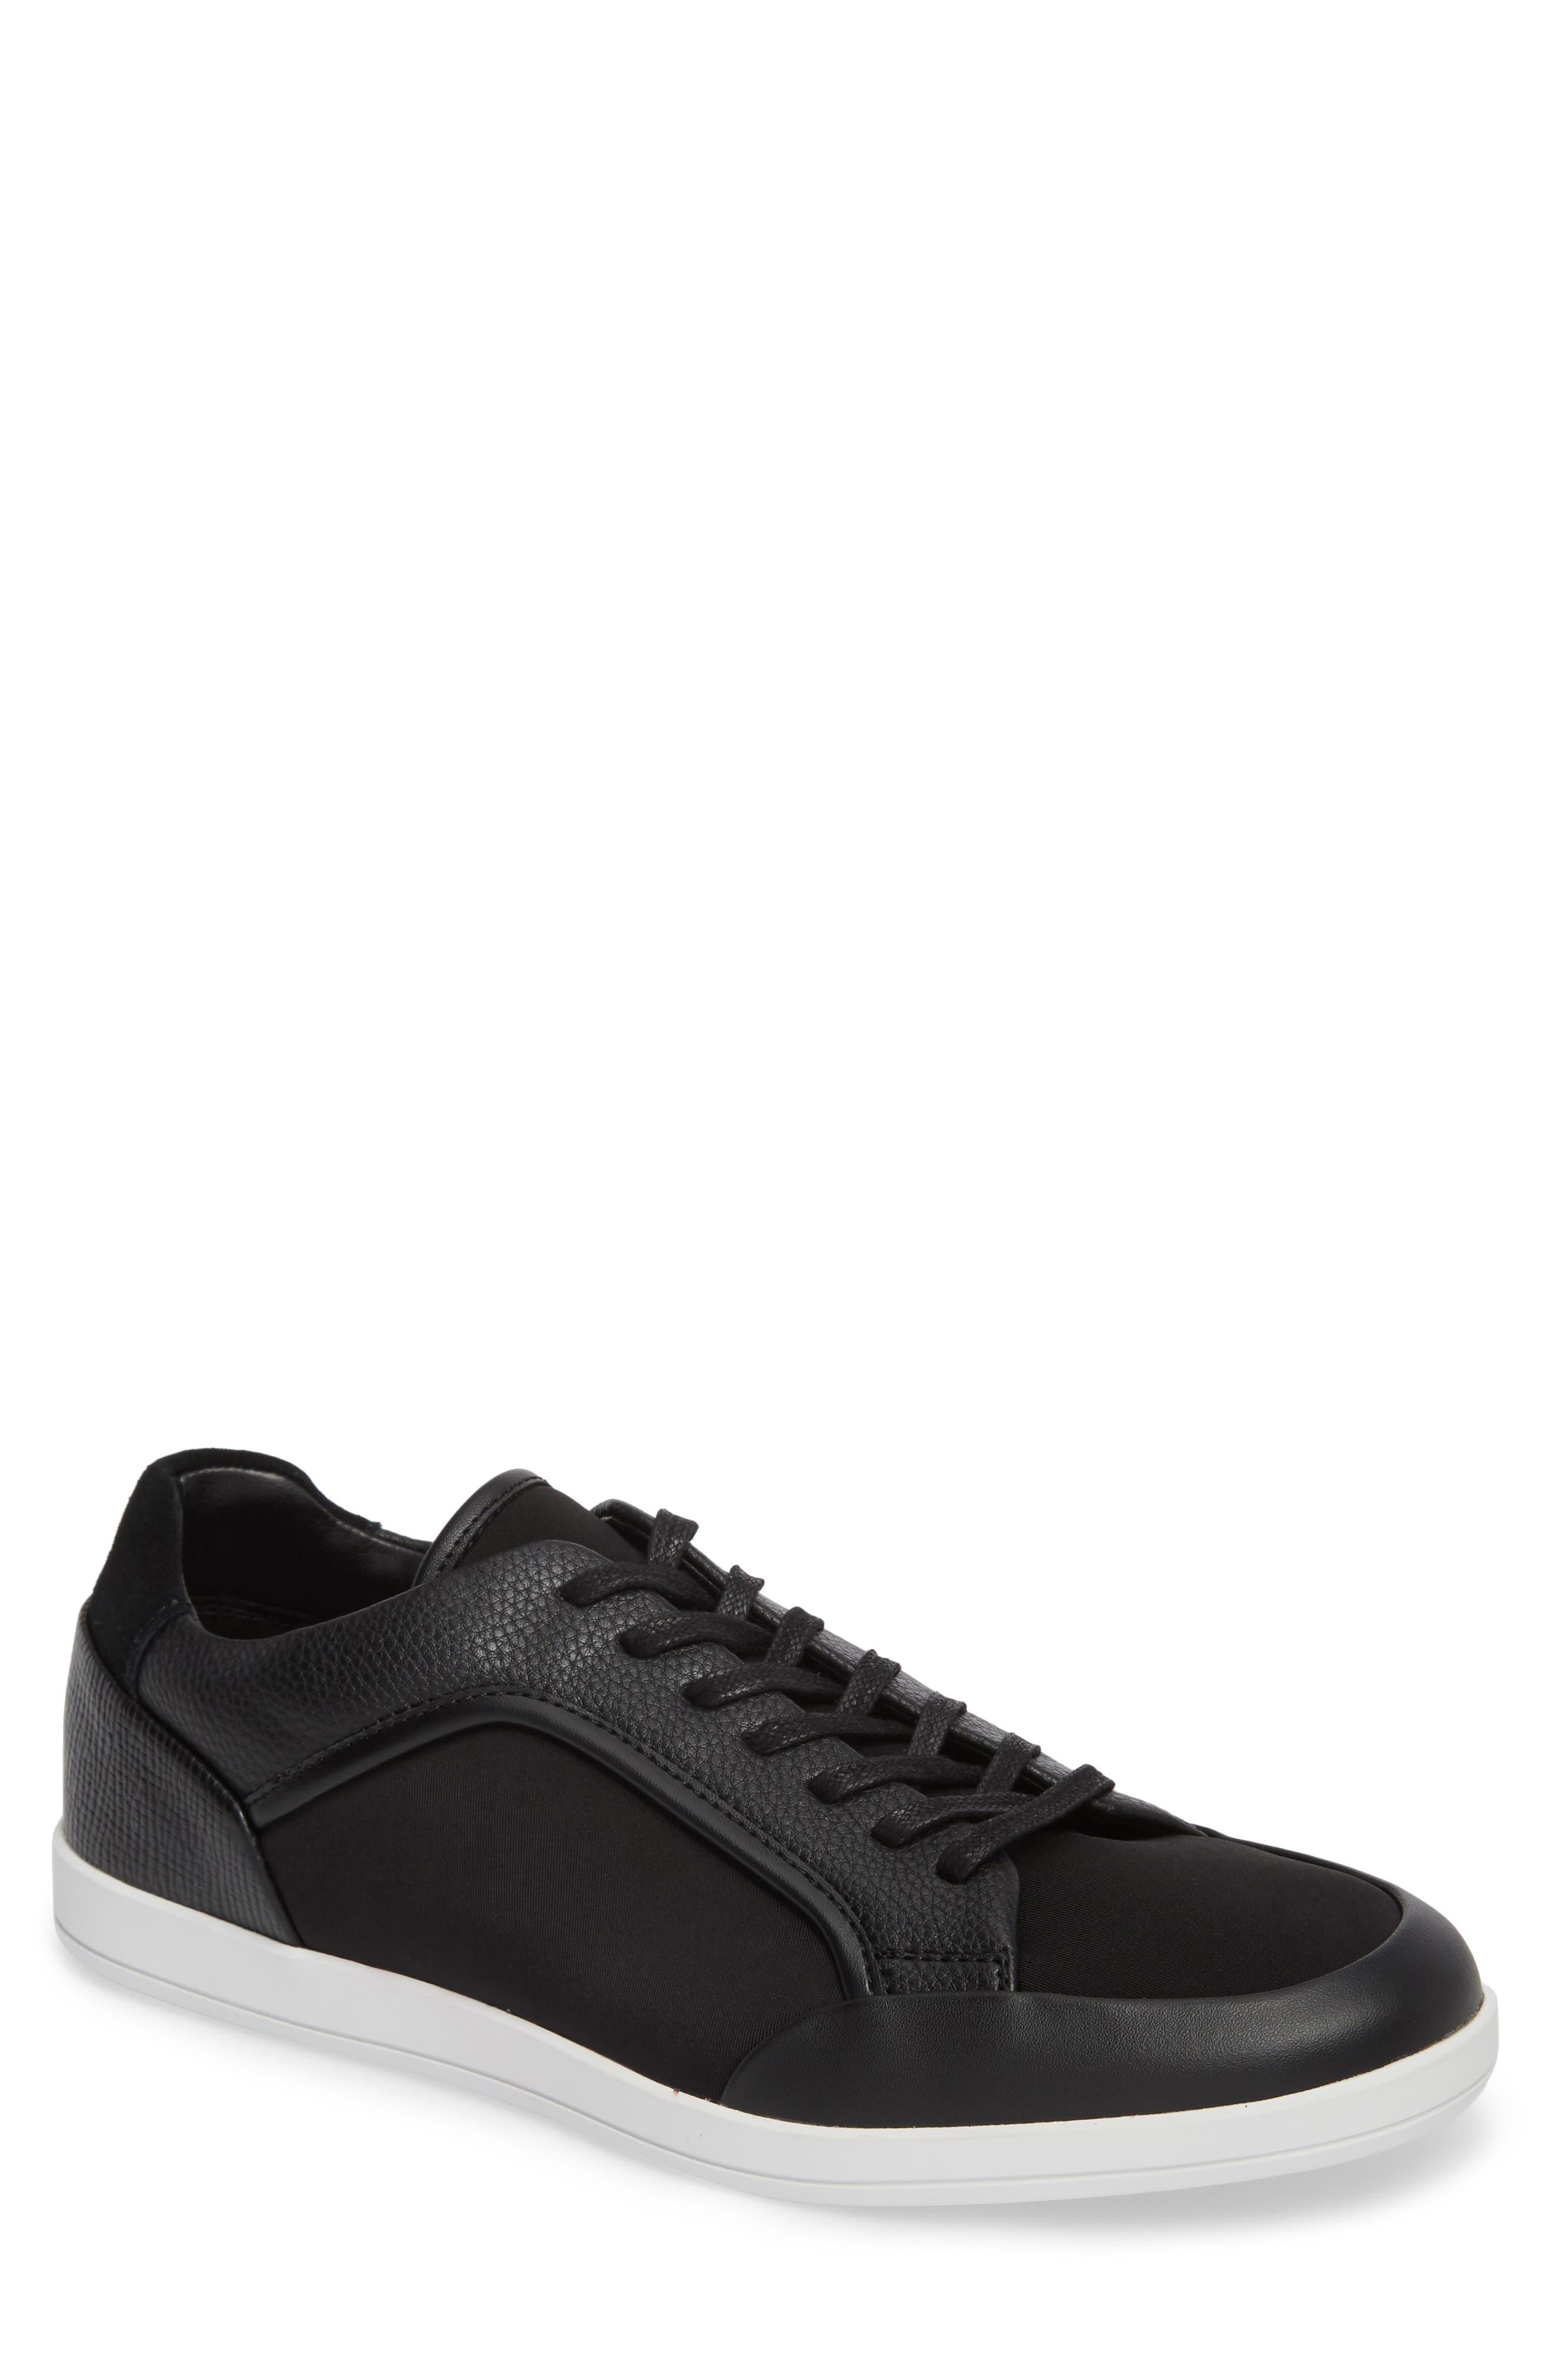 Masen Sneaker,                         Main,                         color, 001